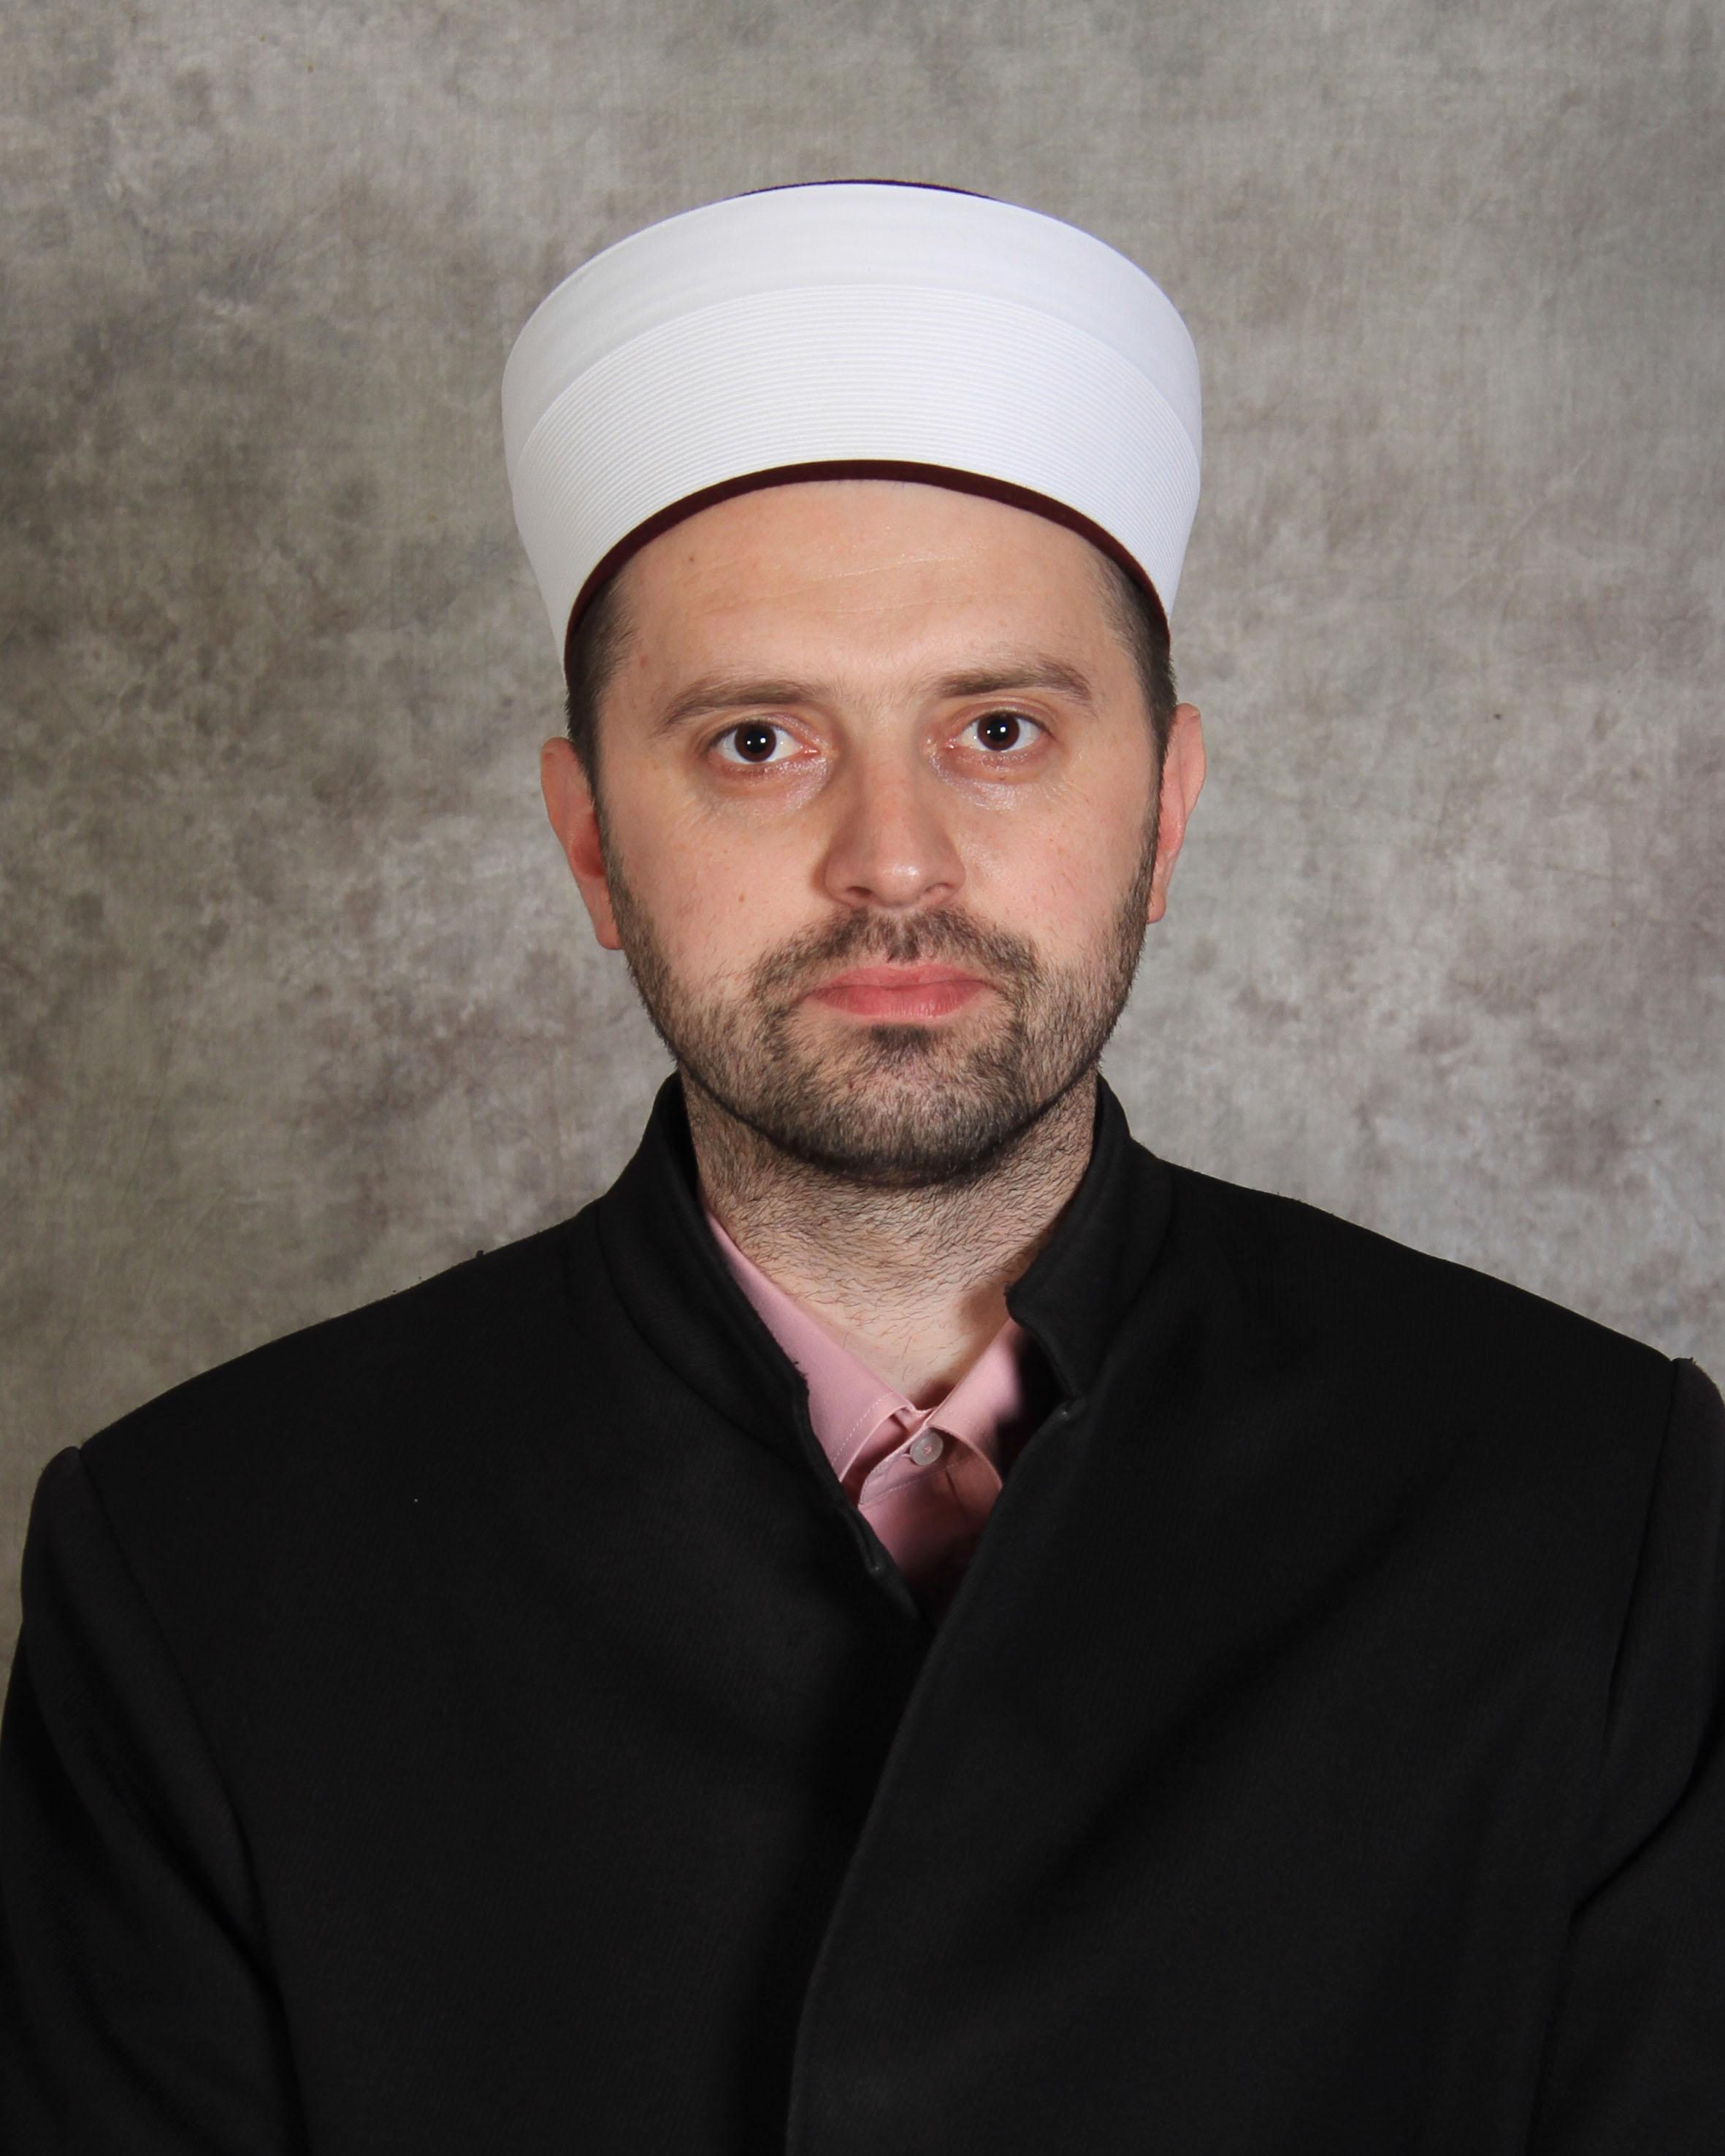 hfz. Ibrahim Bektaš - Hadži Ali-begova džamija